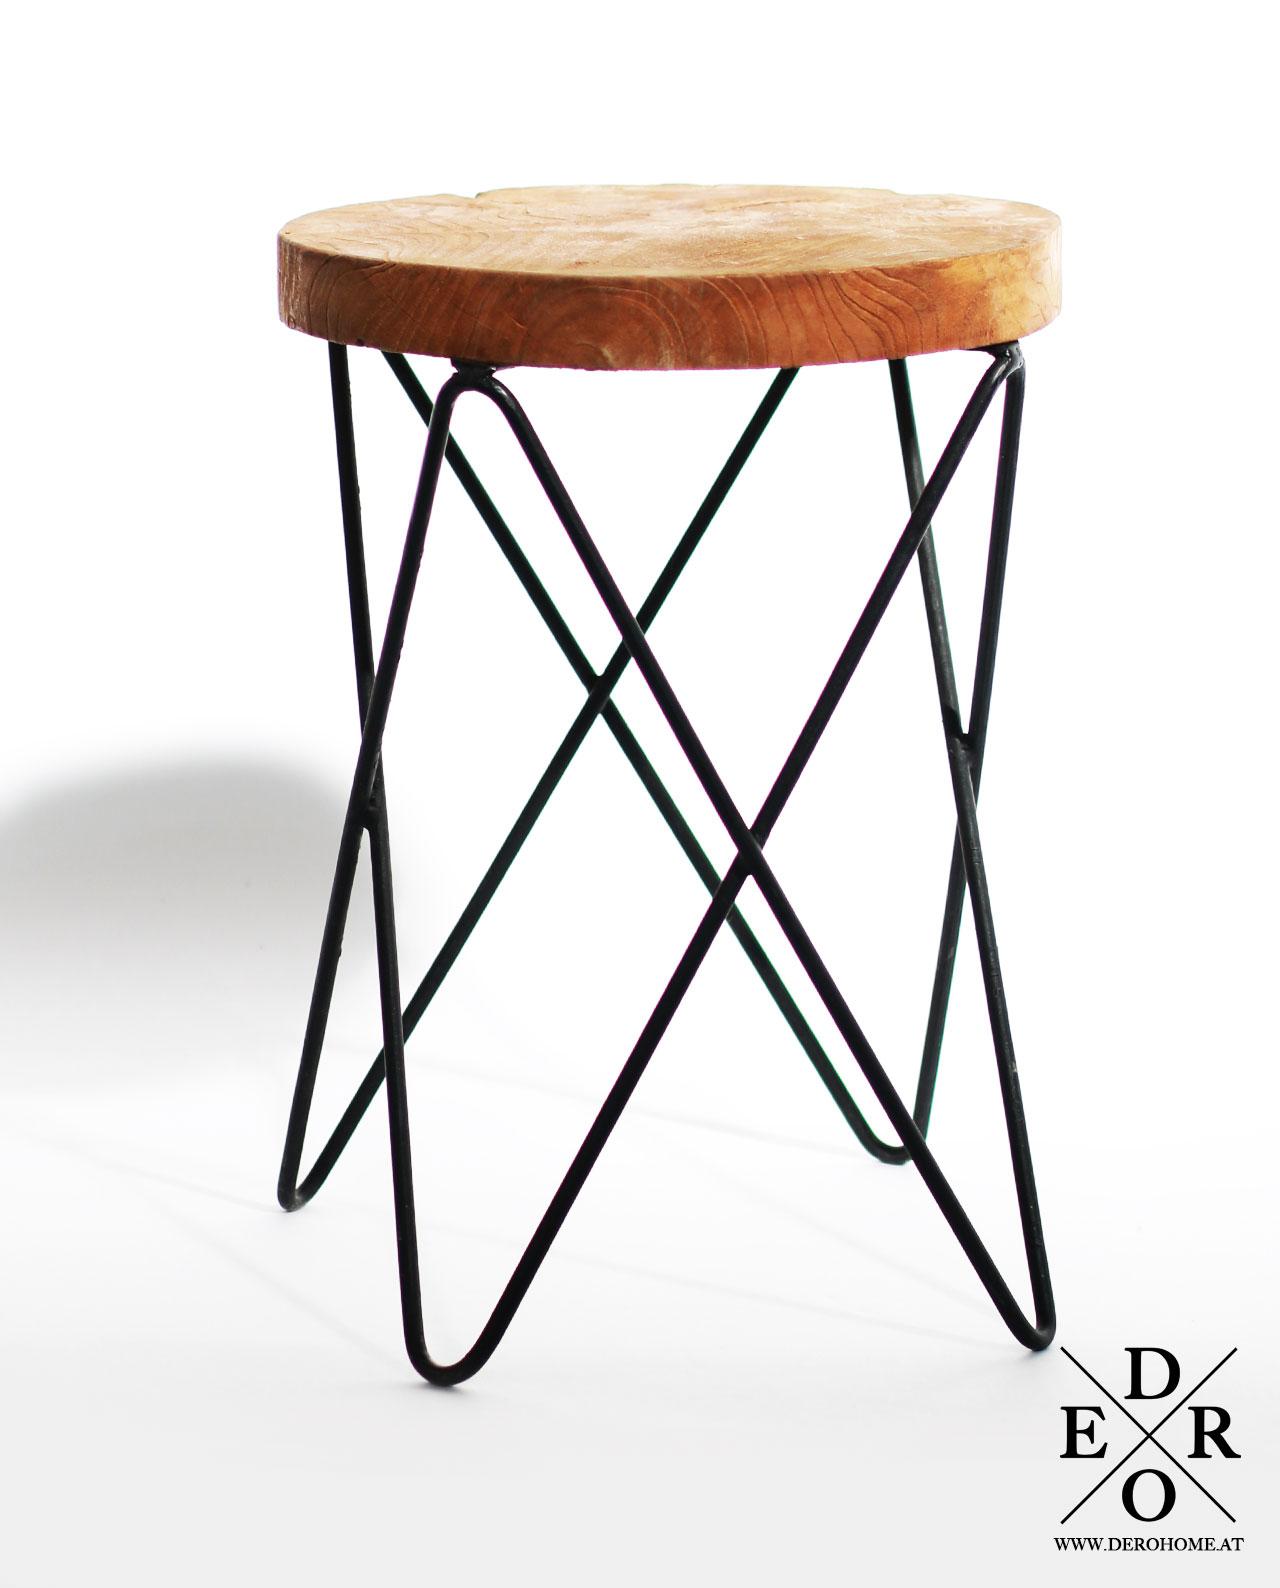 design hocker beistelltisch montr al derohome at. Black Bedroom Furniture Sets. Home Design Ideas